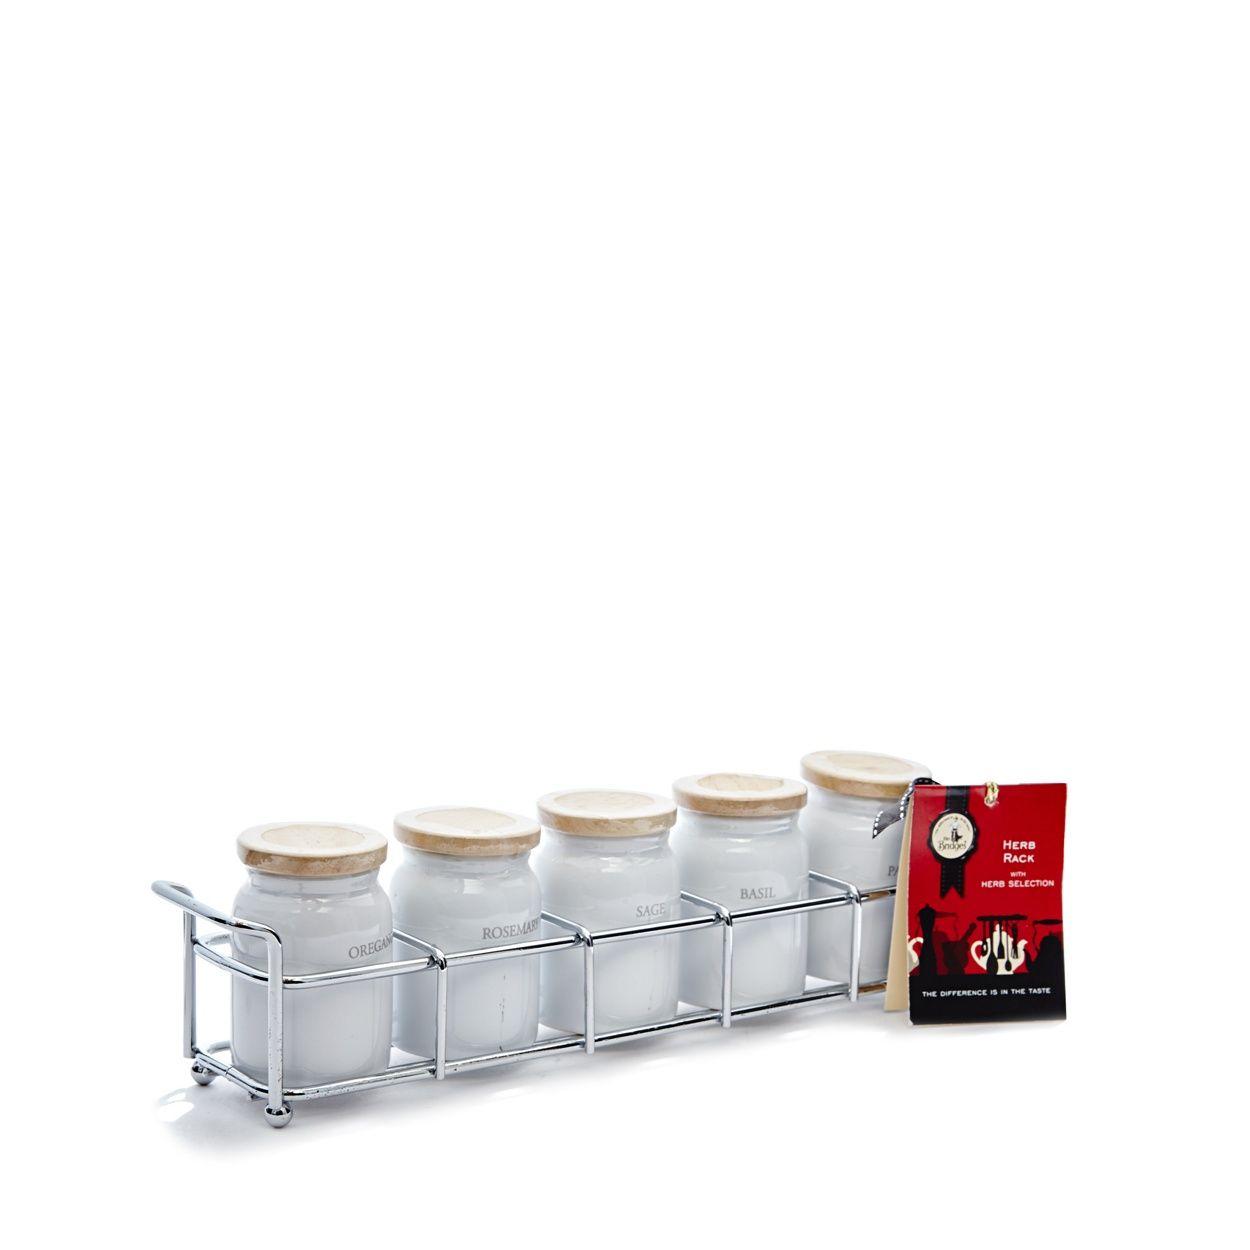 Mrs bridges spice rack set drink gift metal rack wine